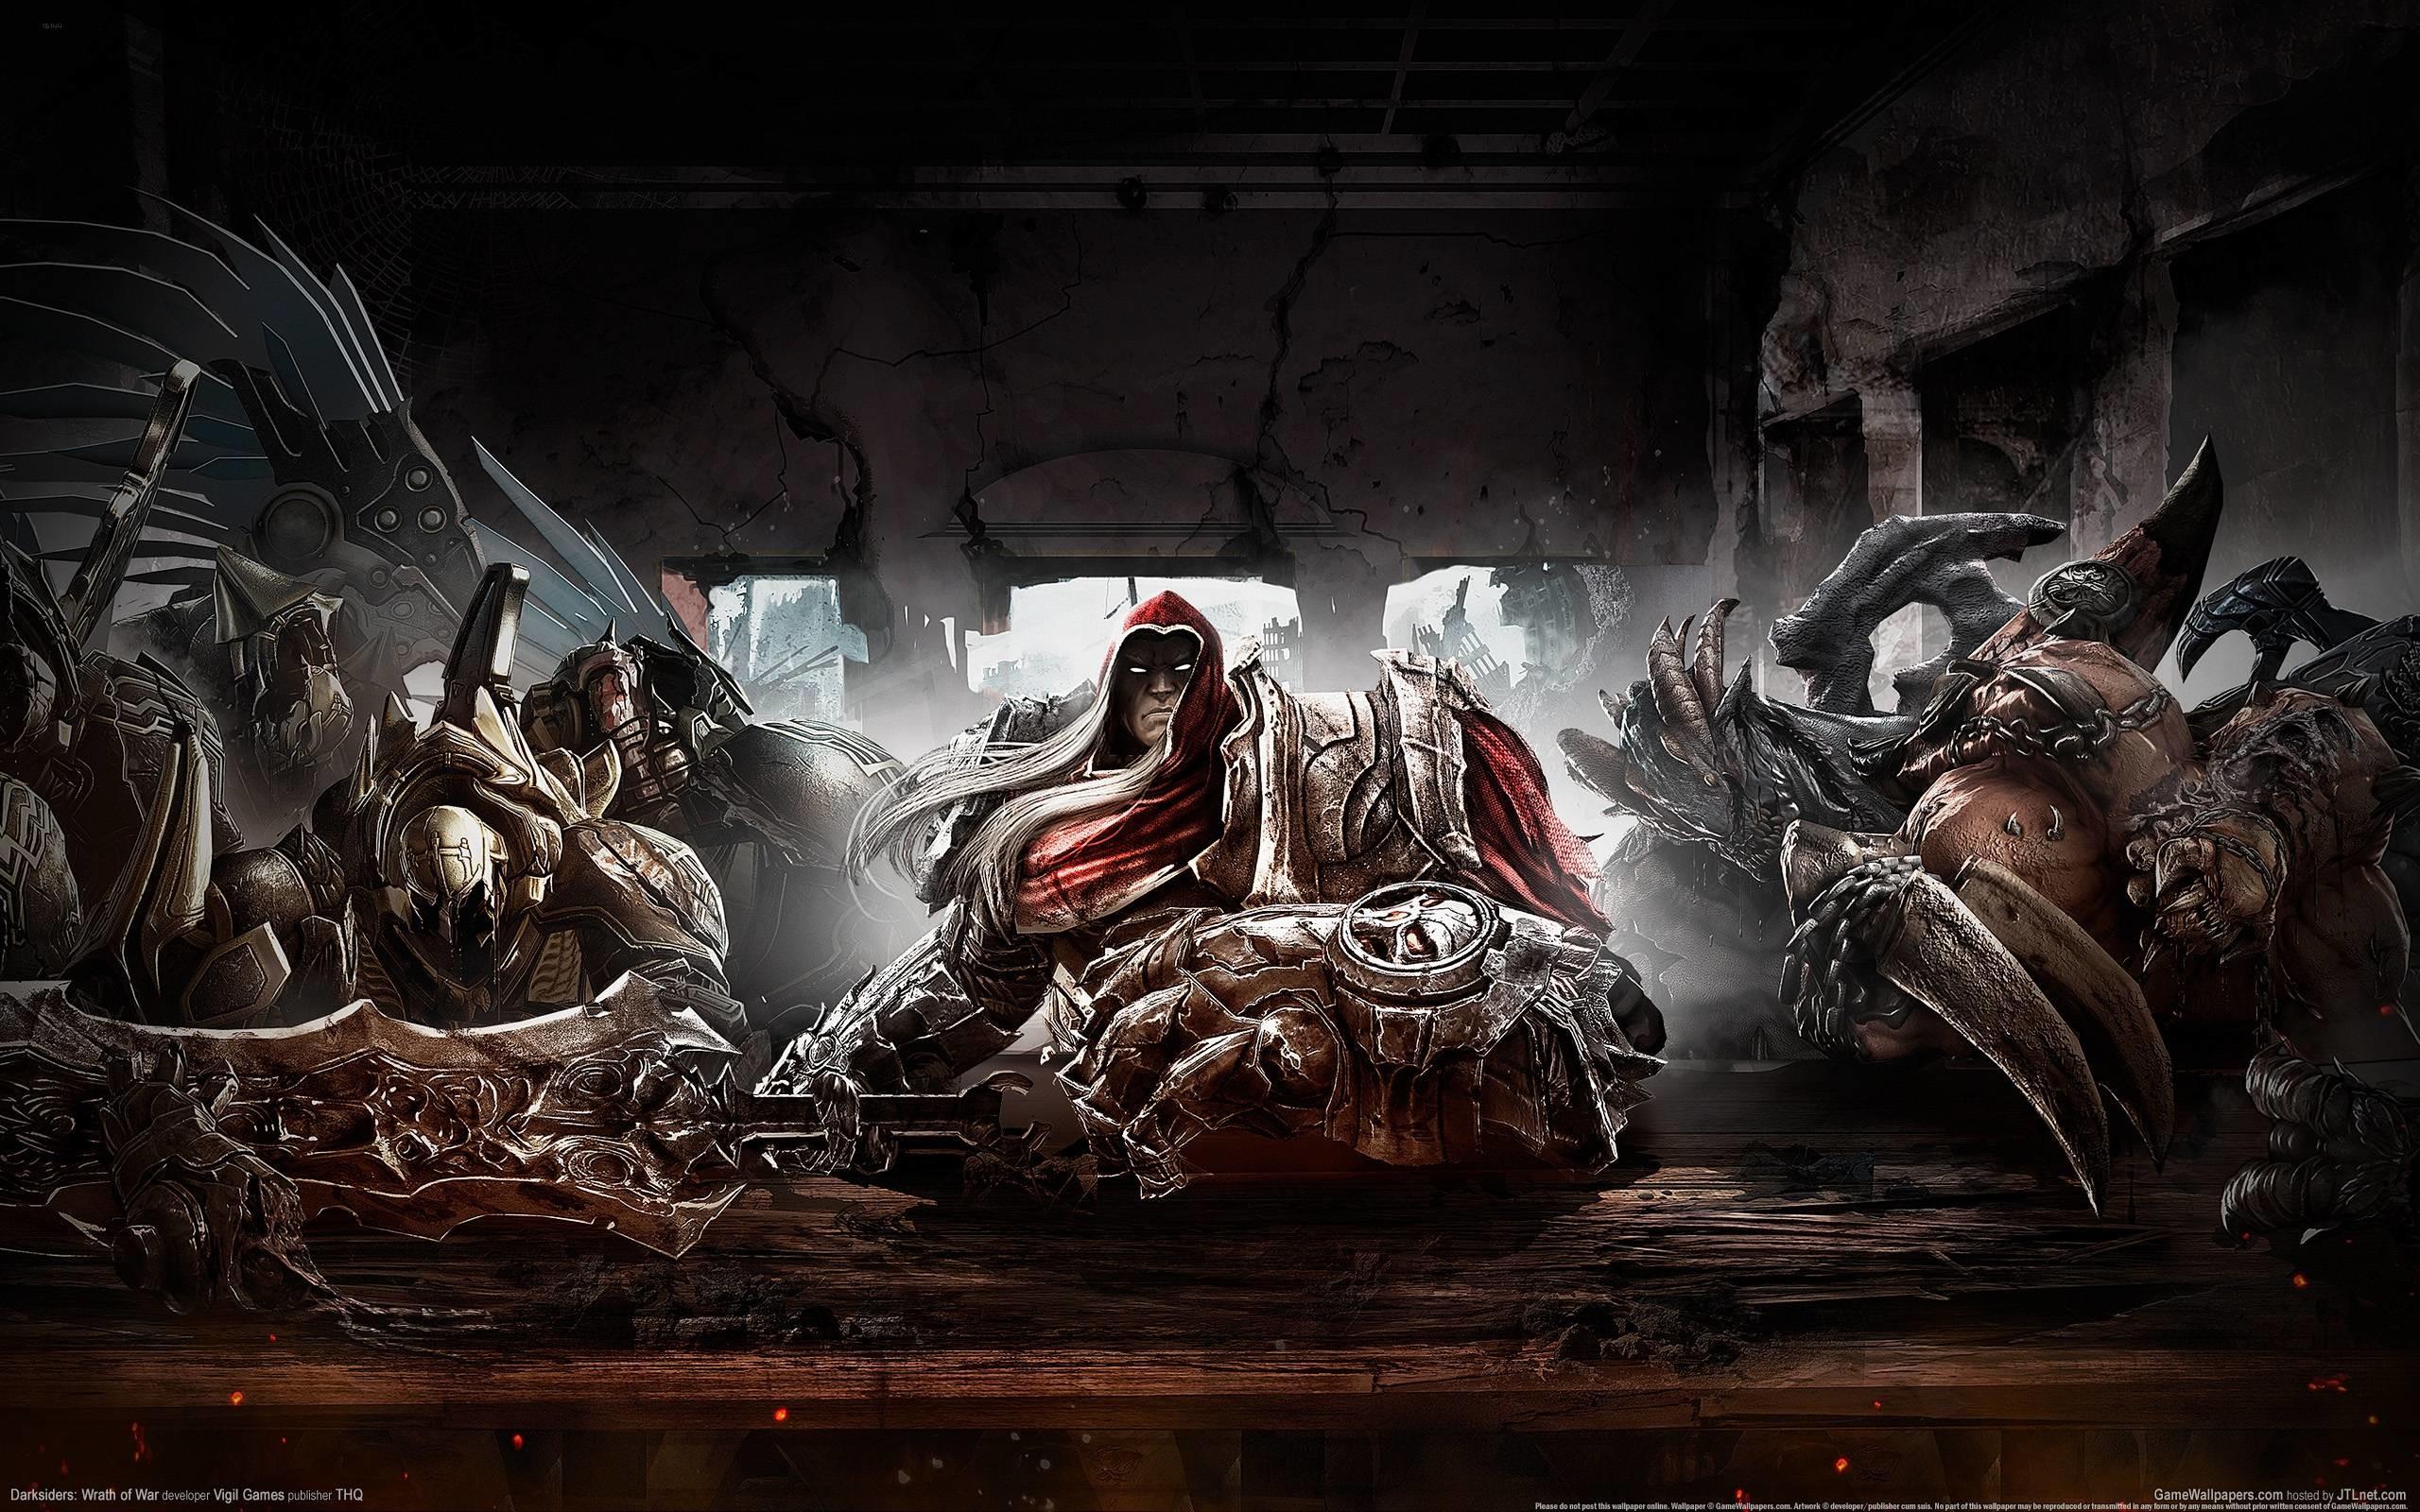 Wallpapers For > Four Horsemen Of The Apocalypse Wallpaper Darksiders